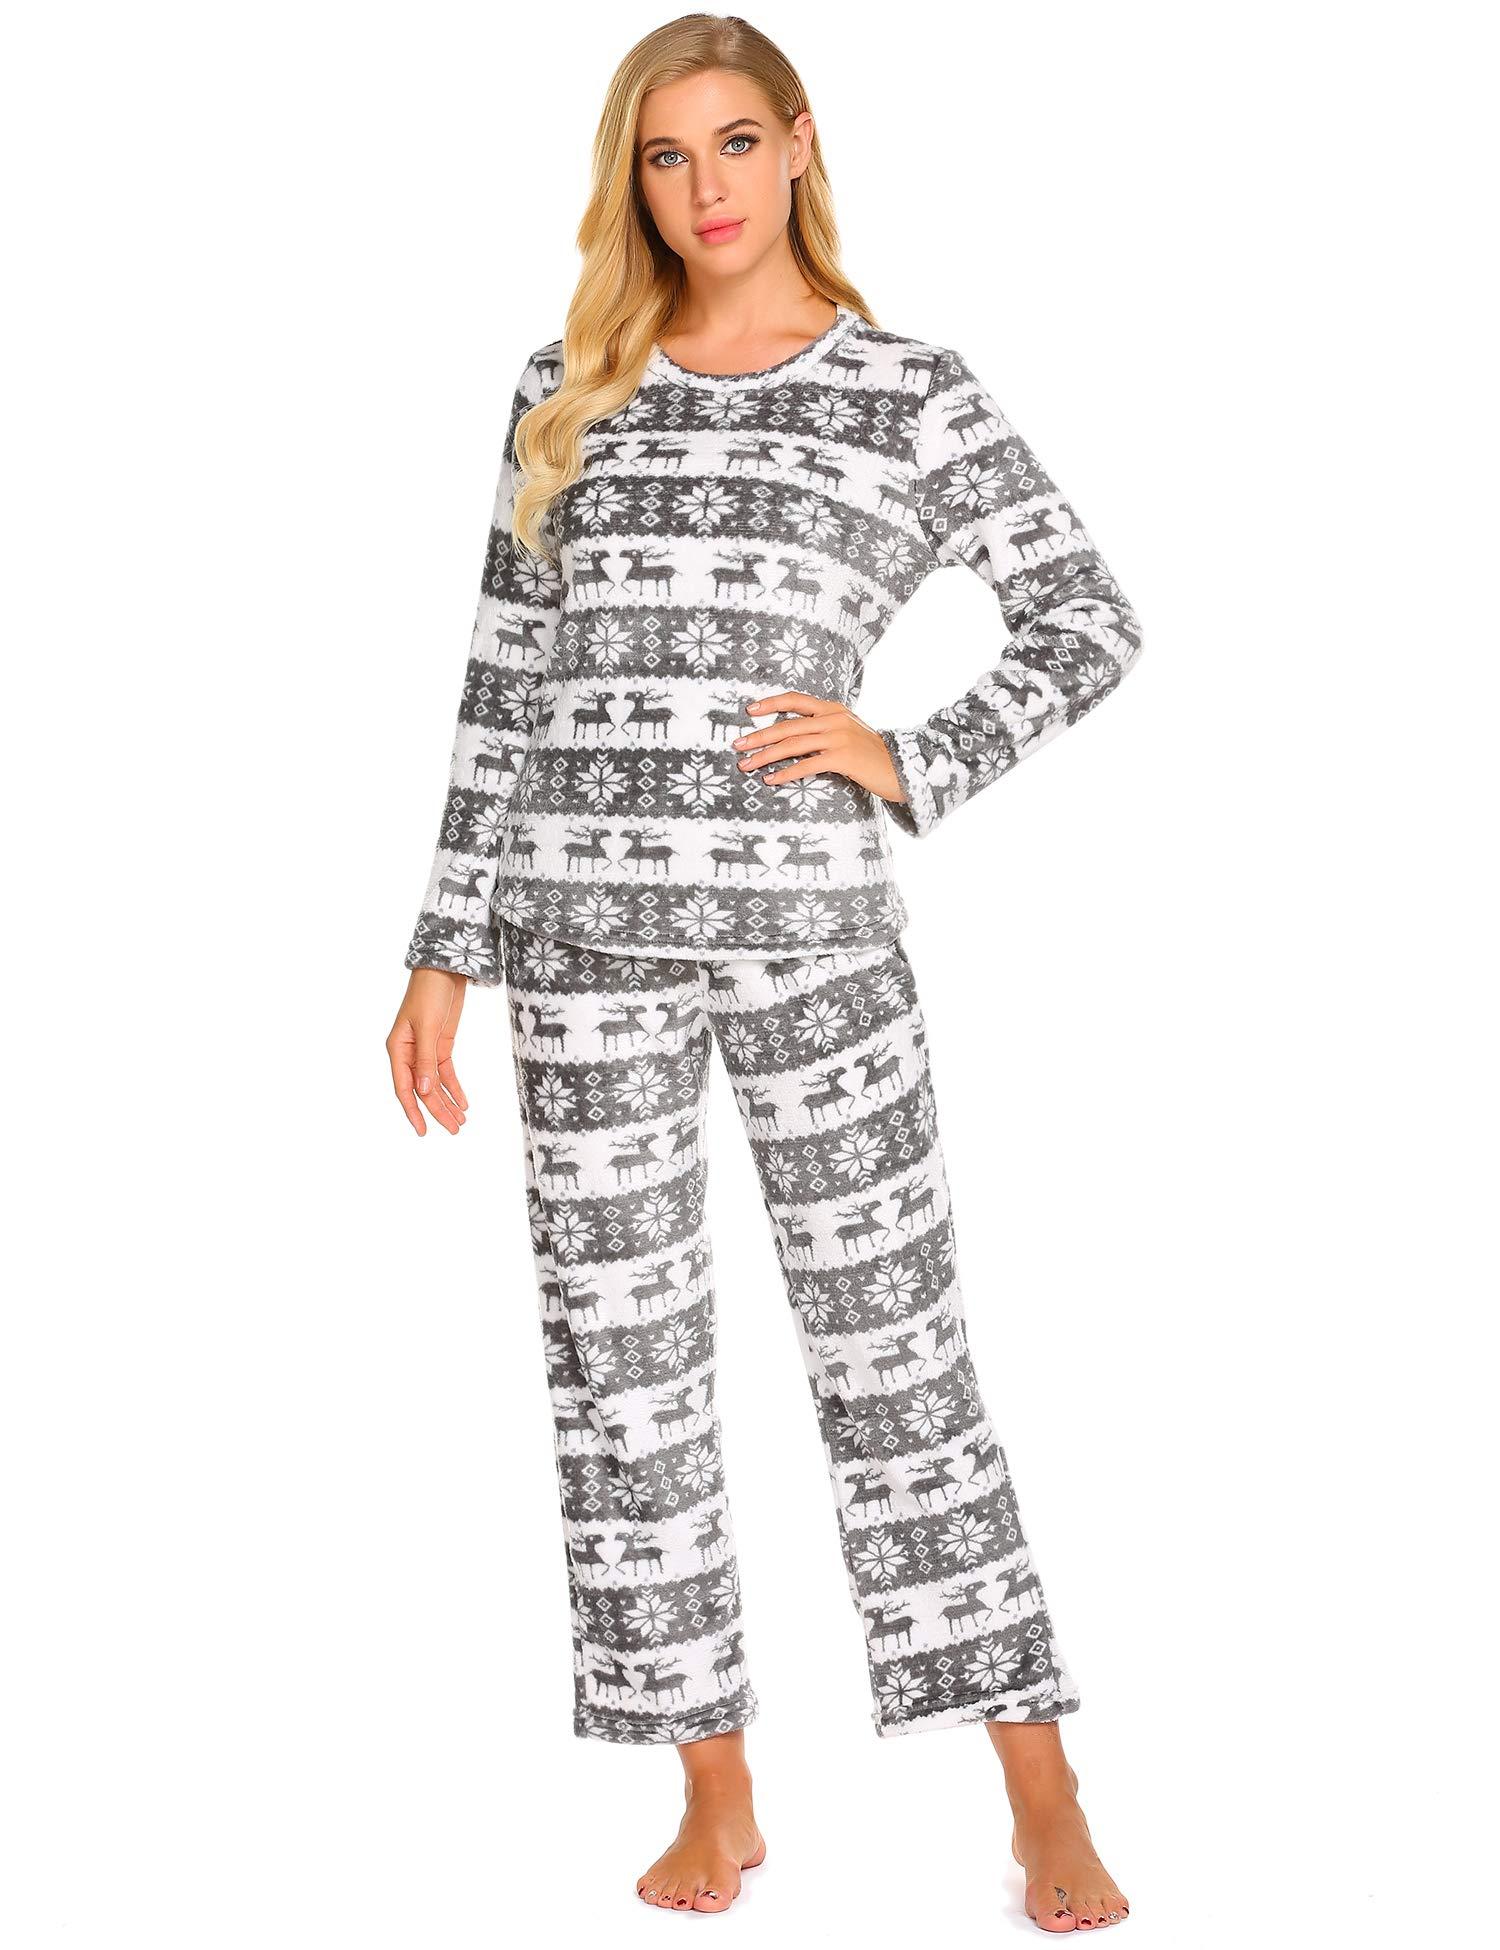 MAXMODA Women's Christmas Pajama Set Fleece Loungewear Sleepwear S-XXL